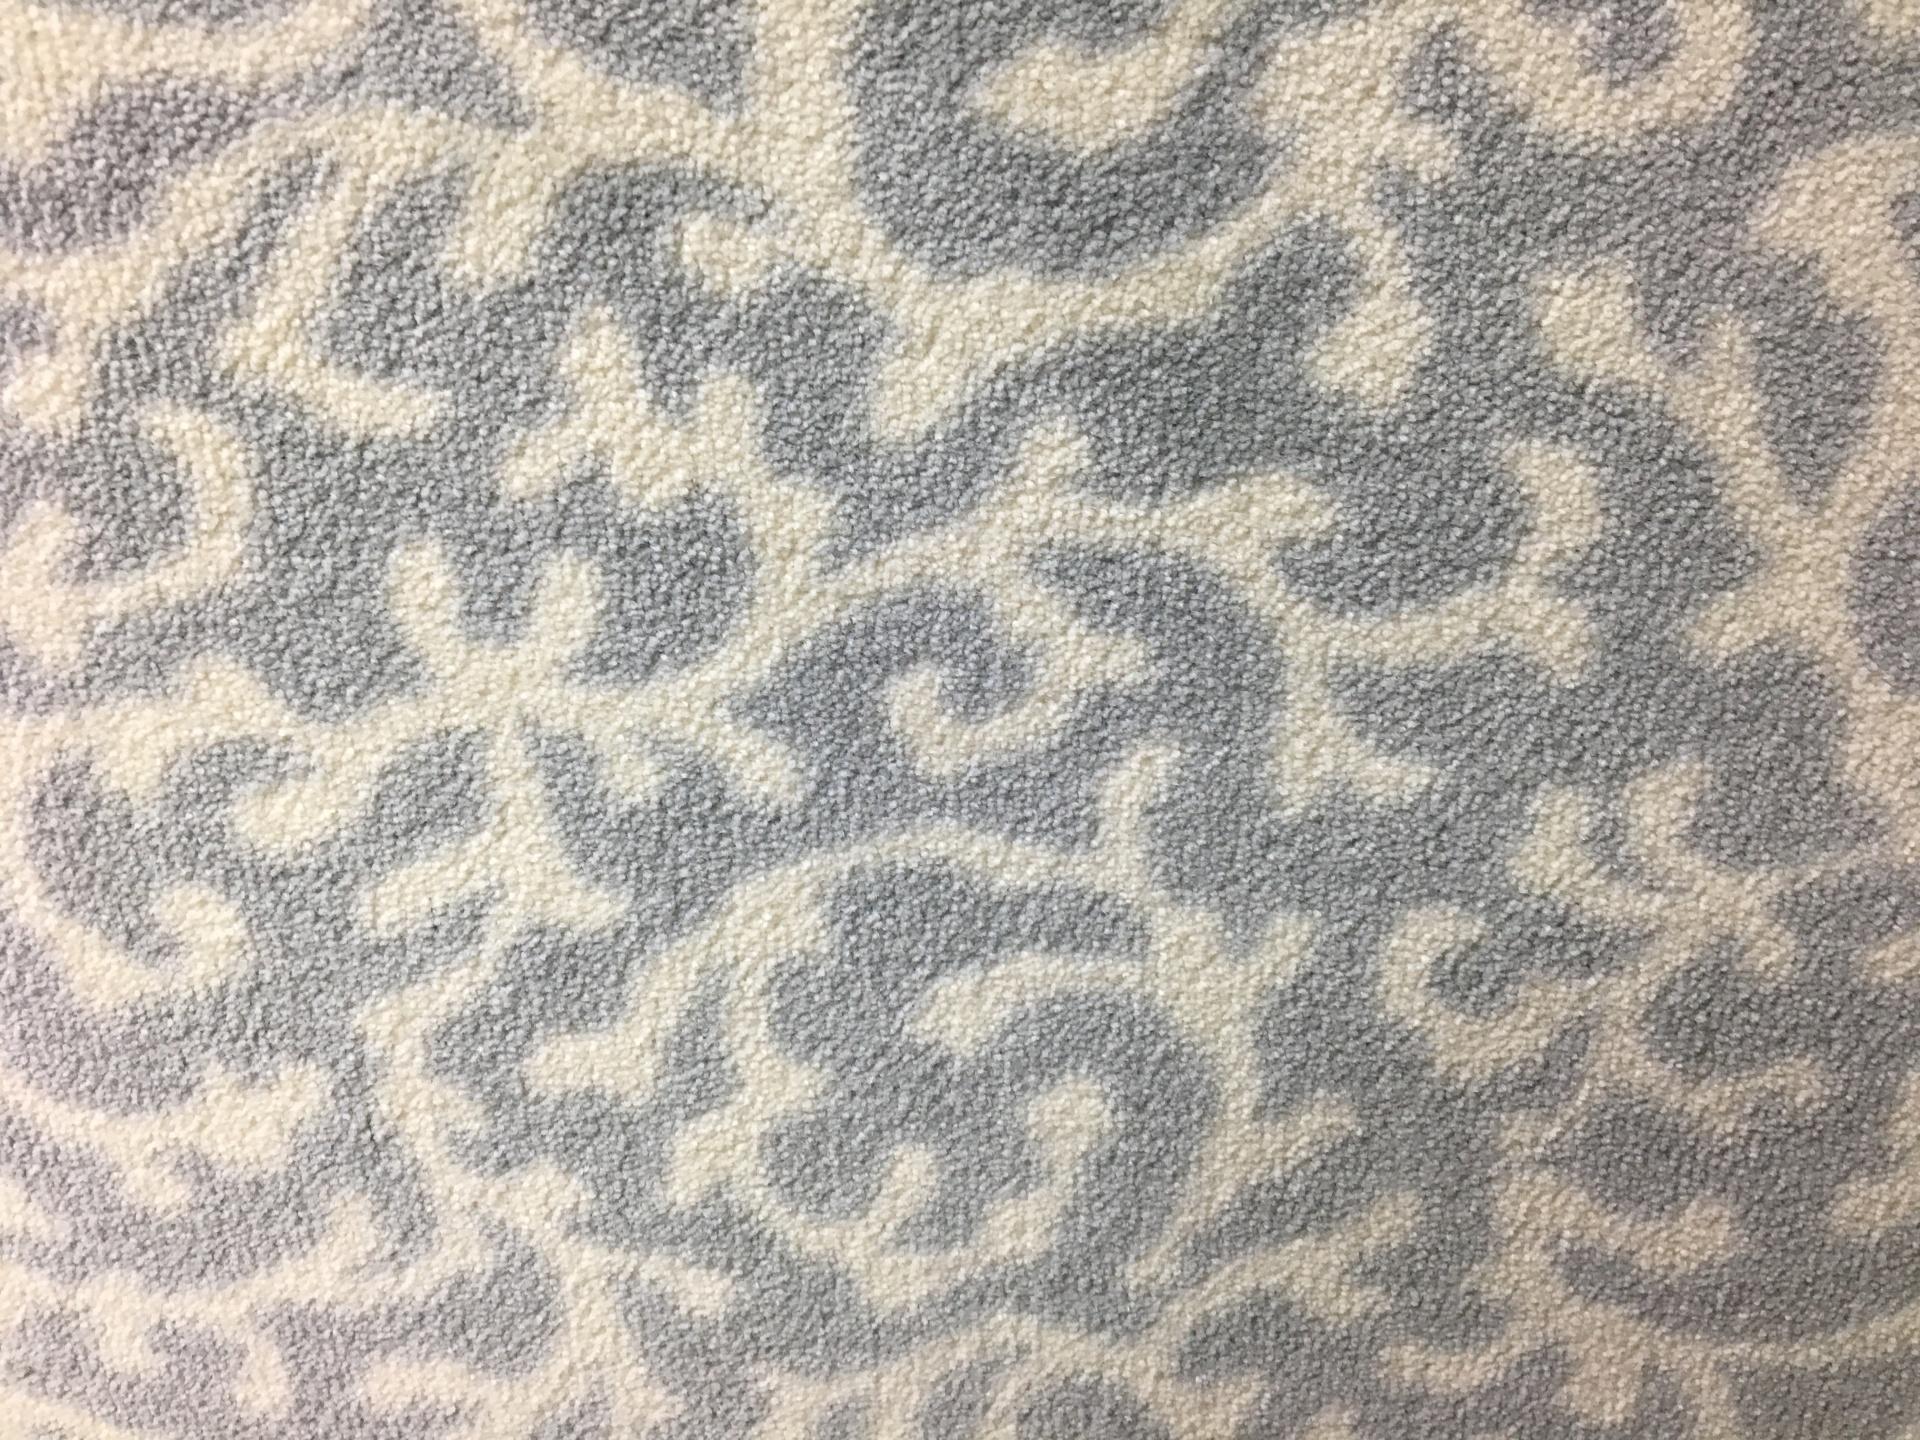 Carpet, area rugs, natural fibers, carpeting, rug, wall to wall carpet, plush, thick, comfortable, soft, clean carpet, milliken, milliken custom carpet